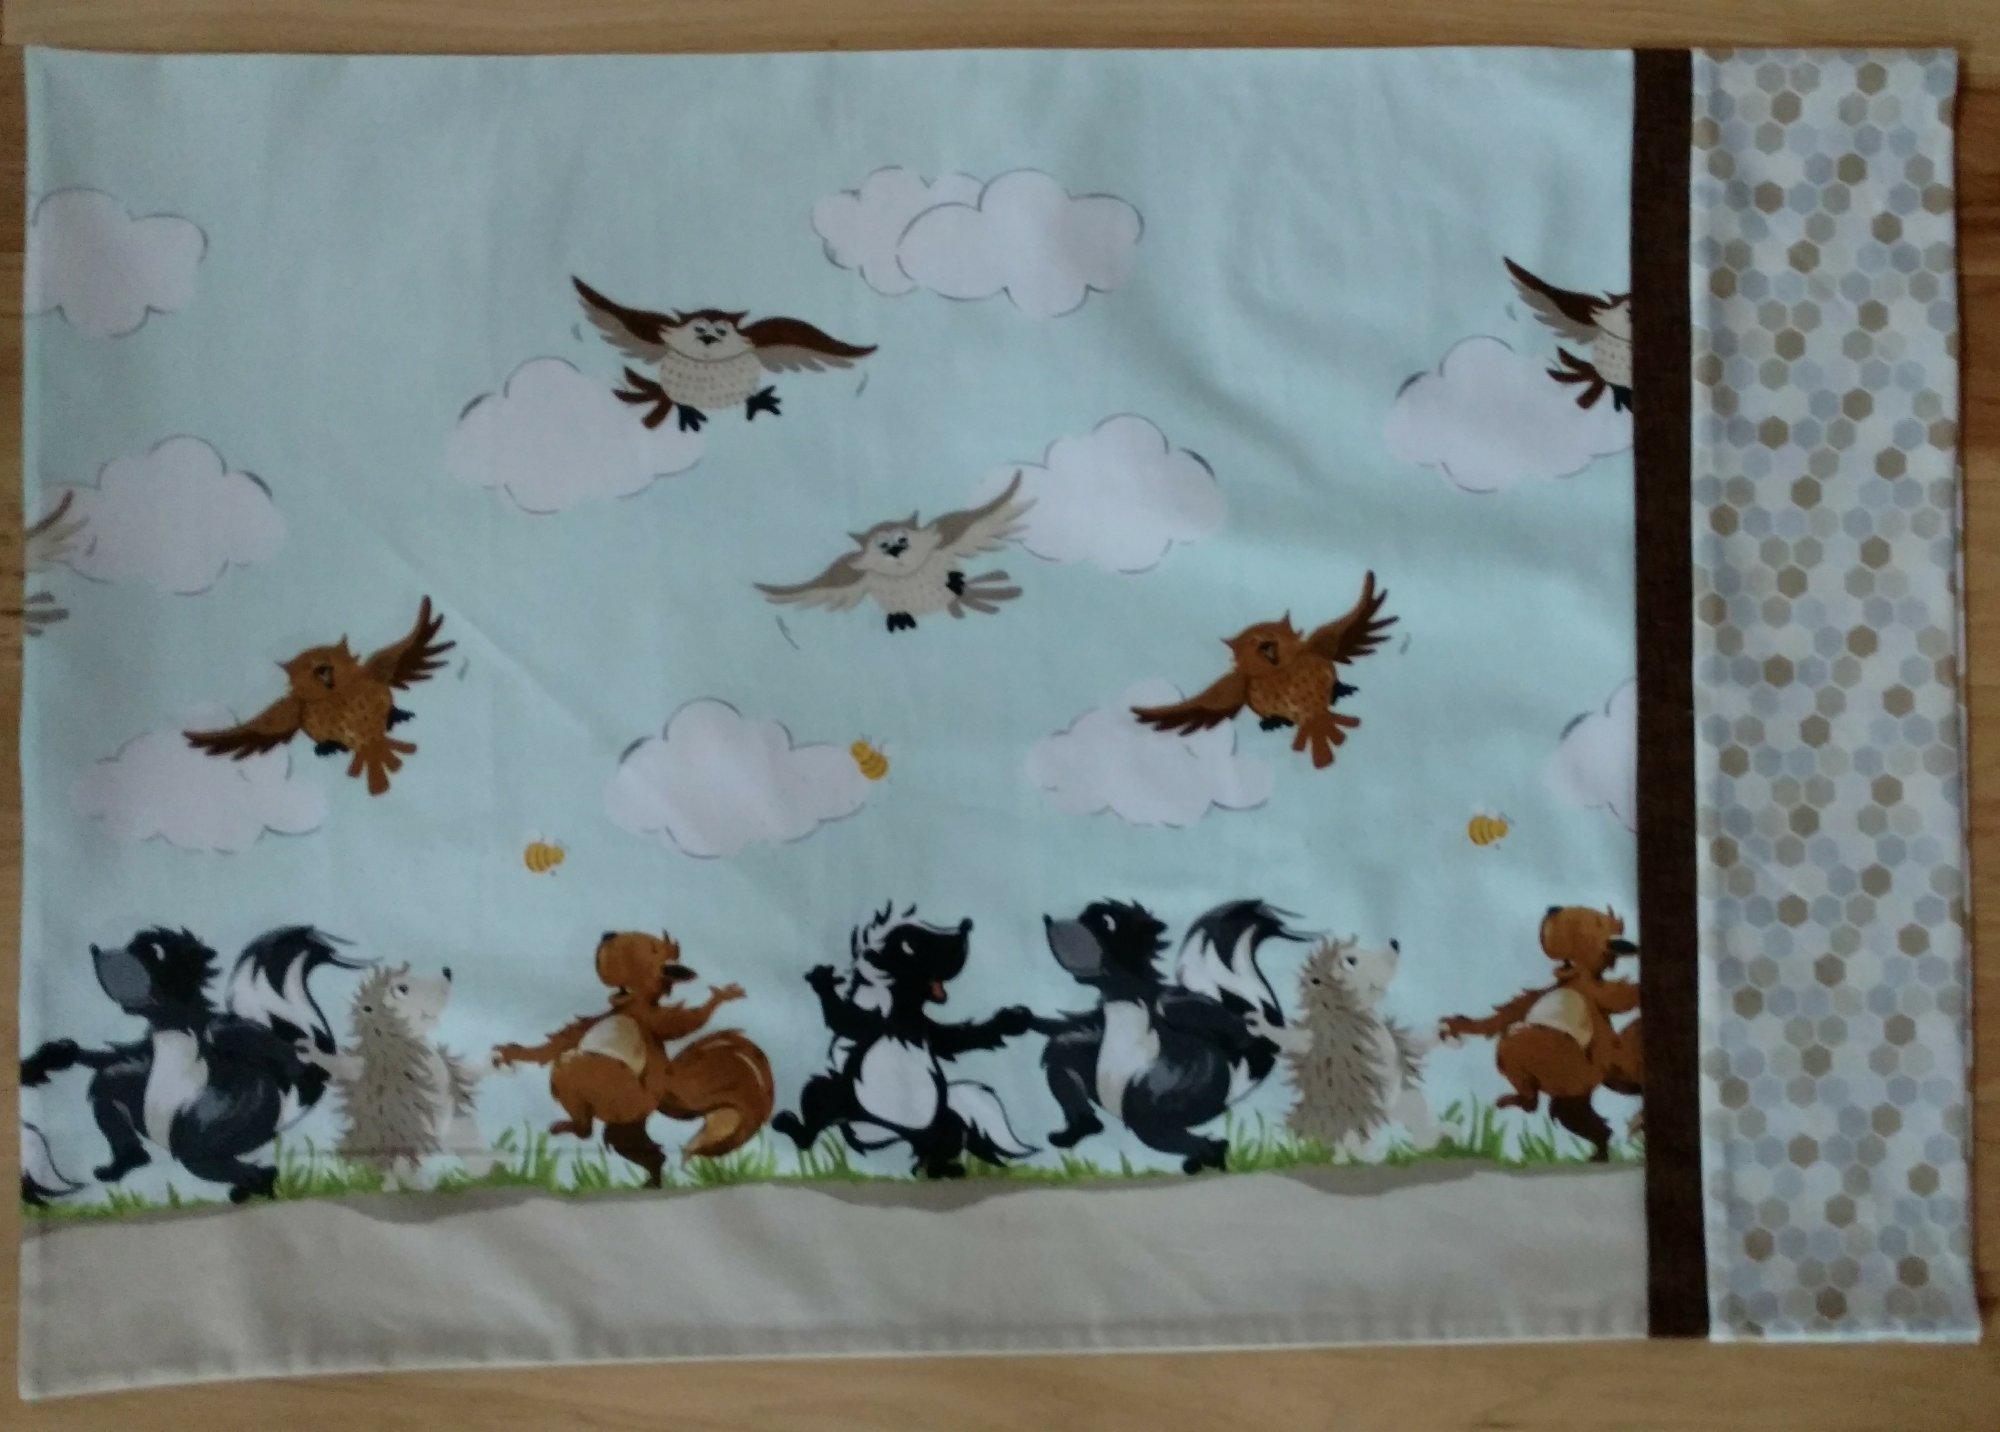 Woodland Animals Pillowcase